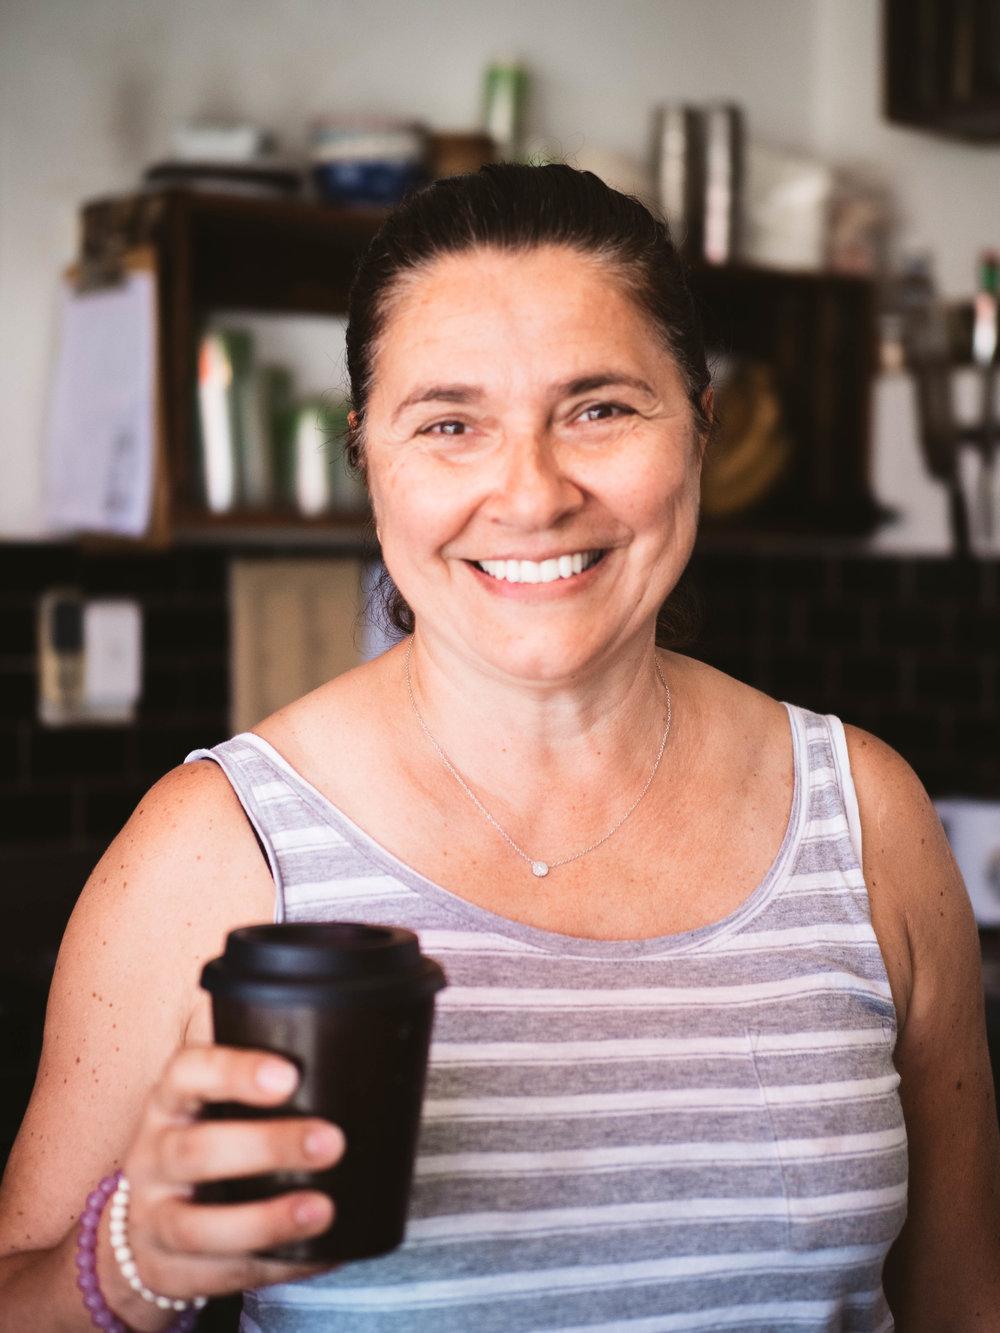 Sondra Beram from Bru Coffee